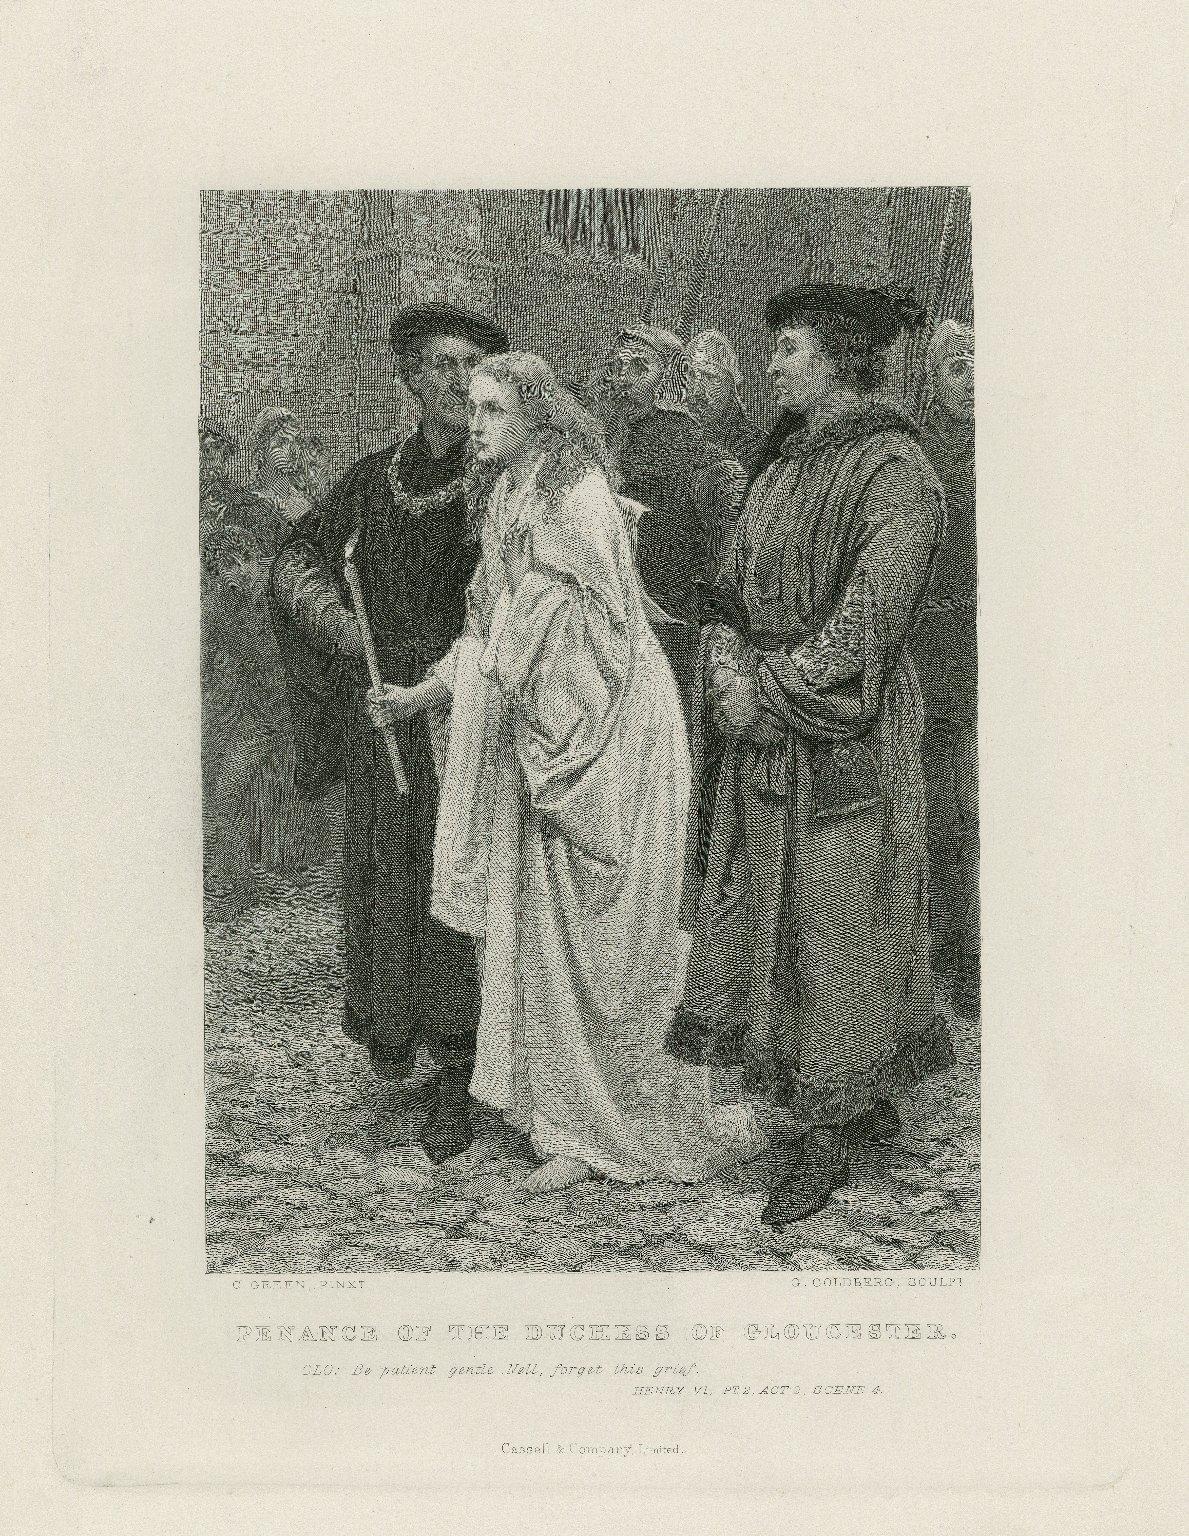 Penance of the Duchess of Gloucester ... Henry VI, pt. 2, act 2, scene 4 [graphic] / C. Green, pinxt. ; G. Goldberg, sculpt.